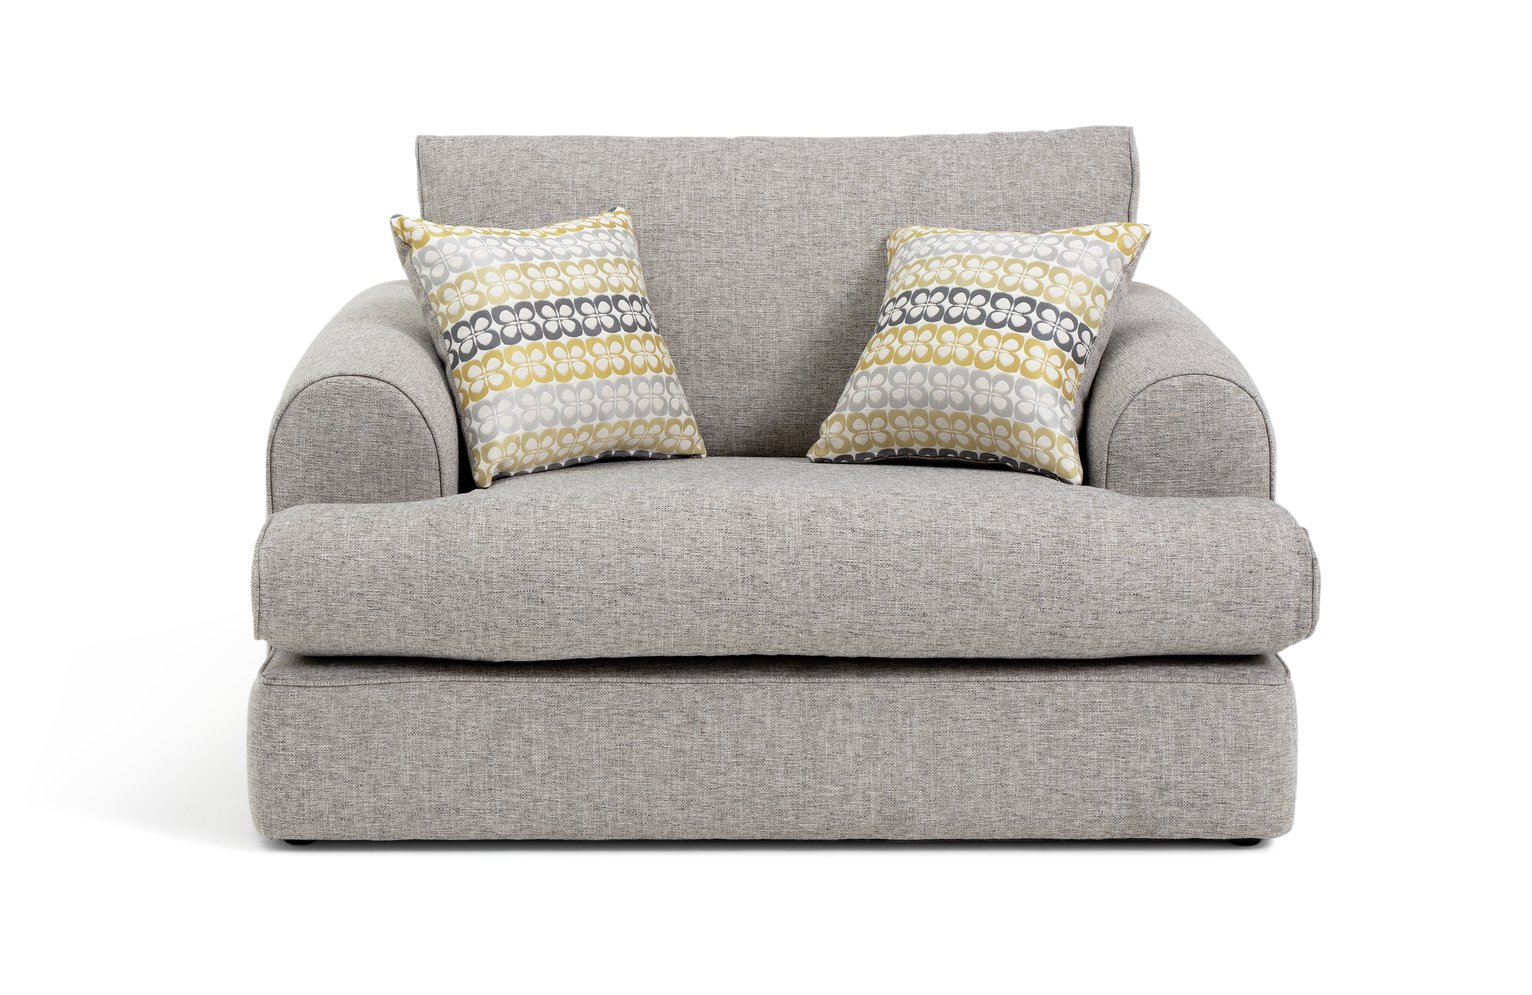 Argos Home Atticus Fabric Cuddle Chair - Grey